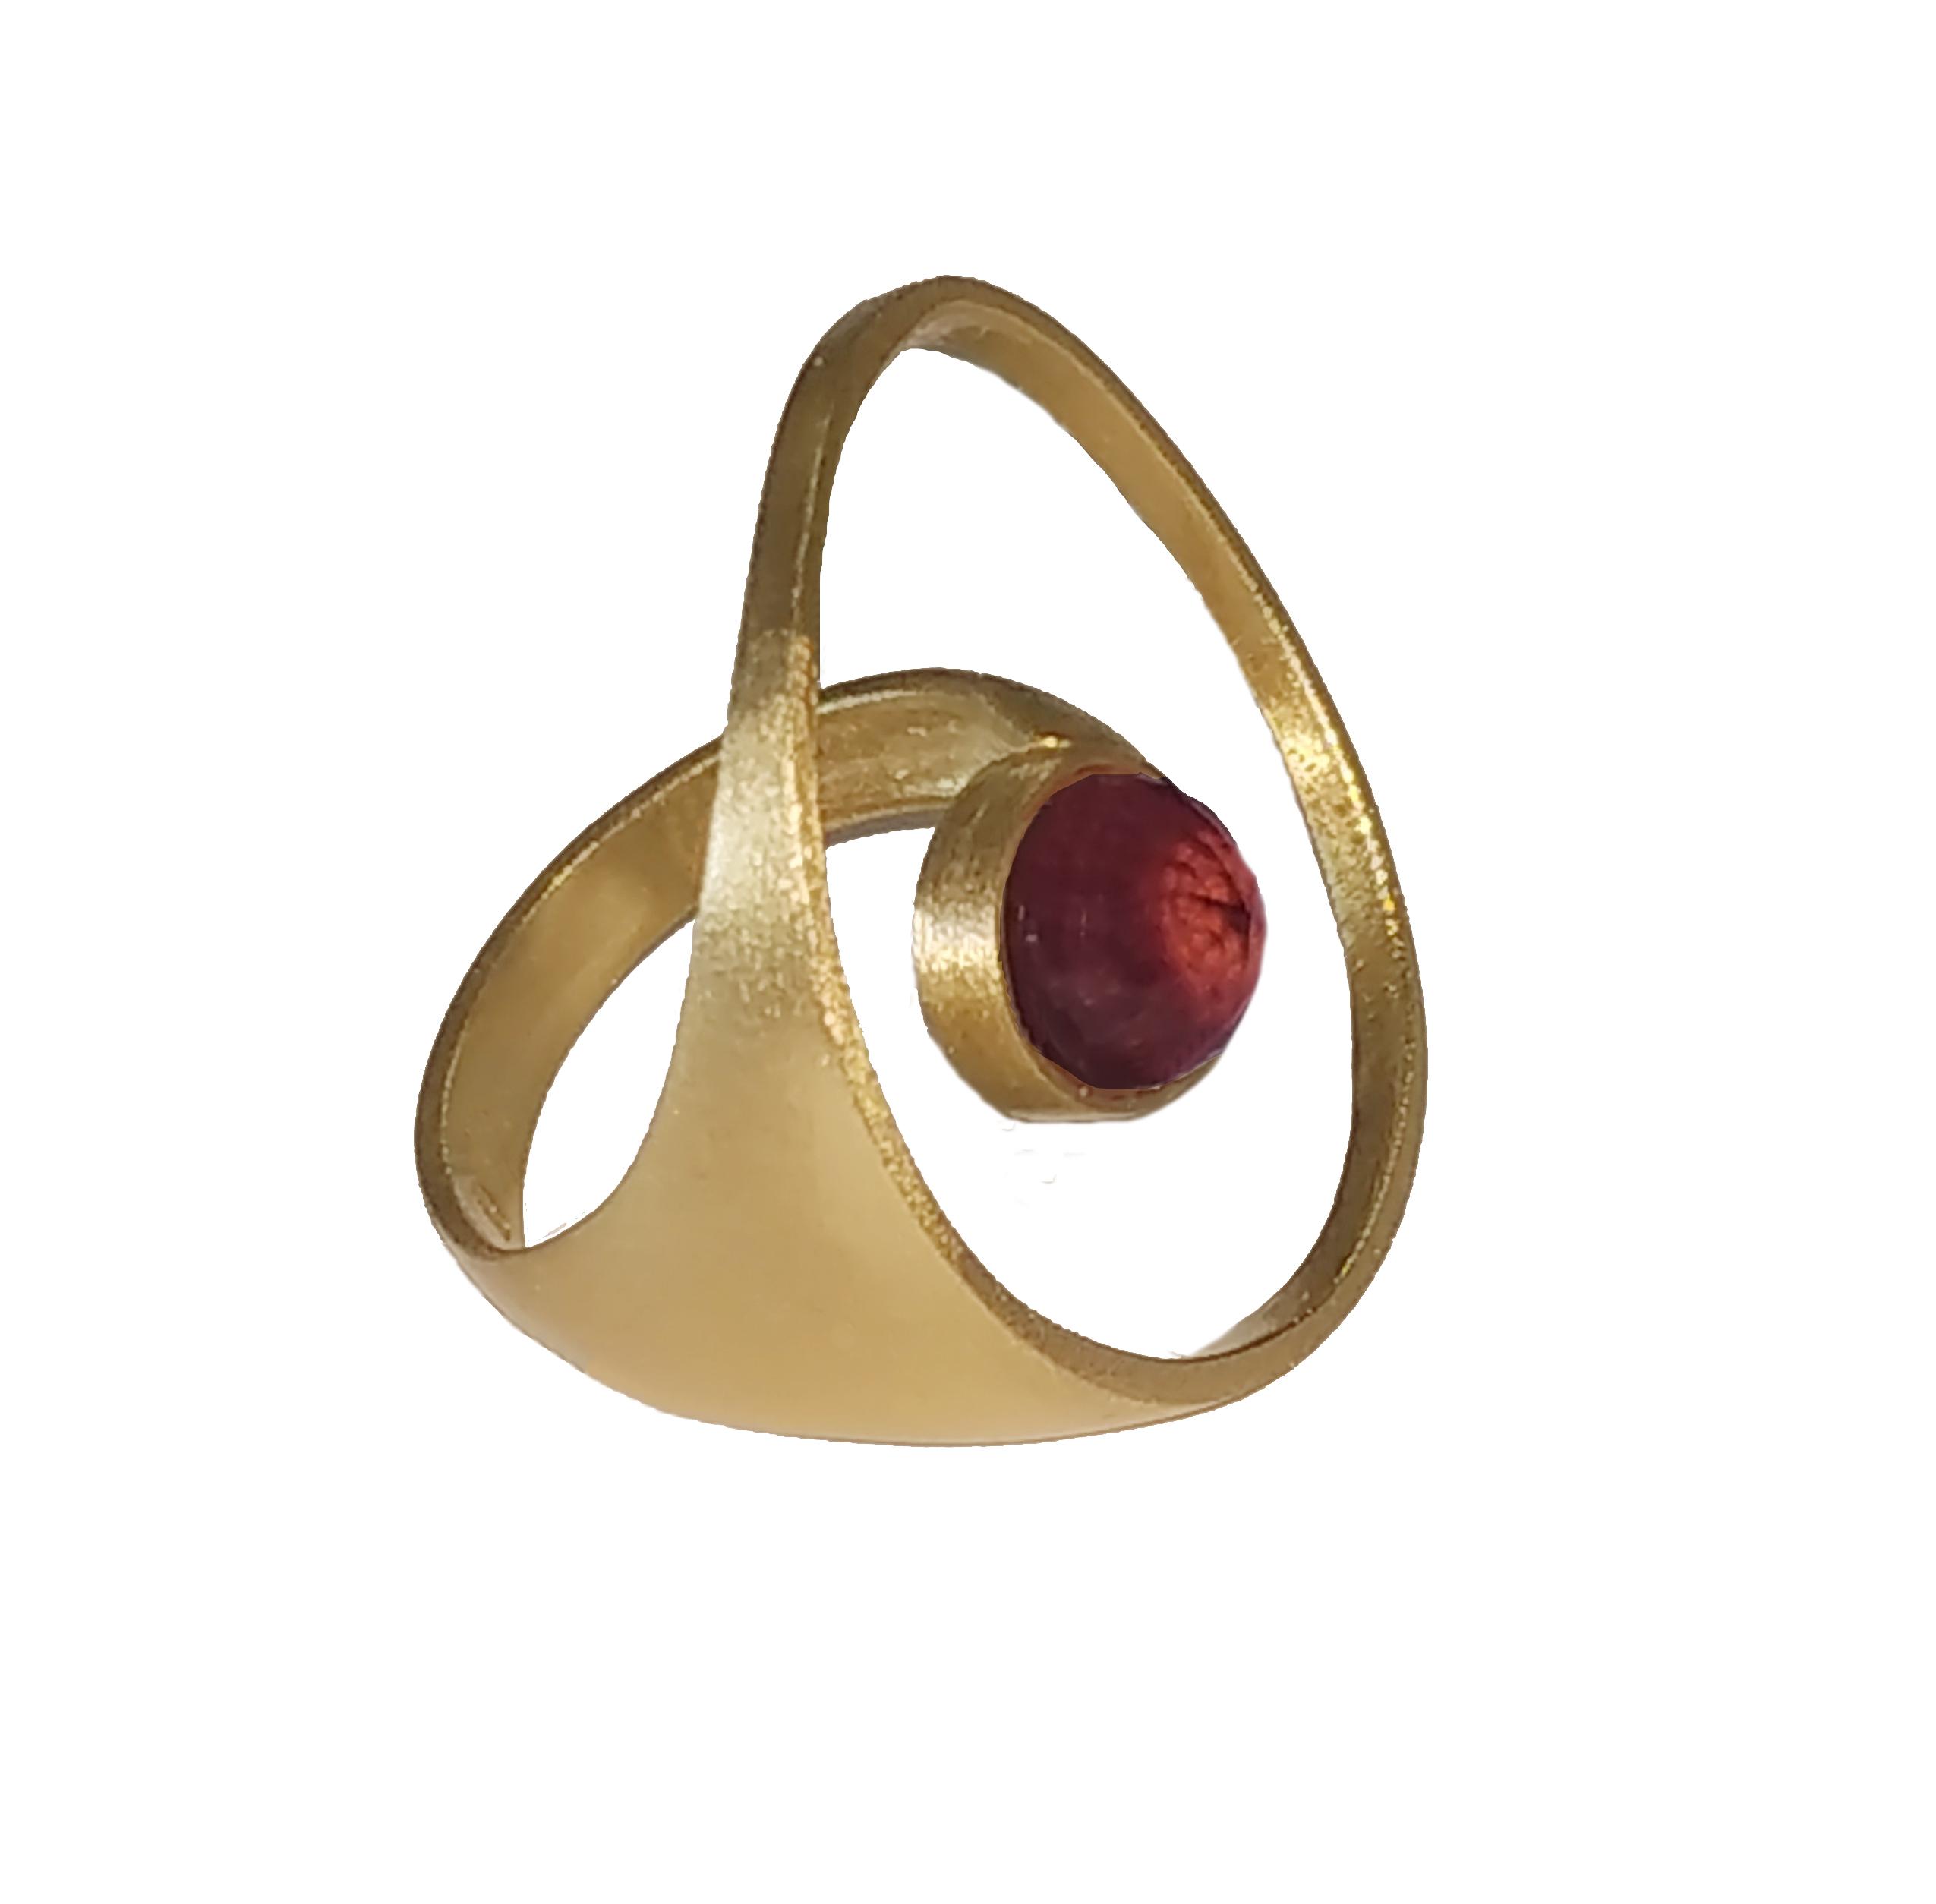 ARTE Ασημένιο επίχρυσο δαχτυλίδι κύκλος χαλαζίας ρουμπίνι